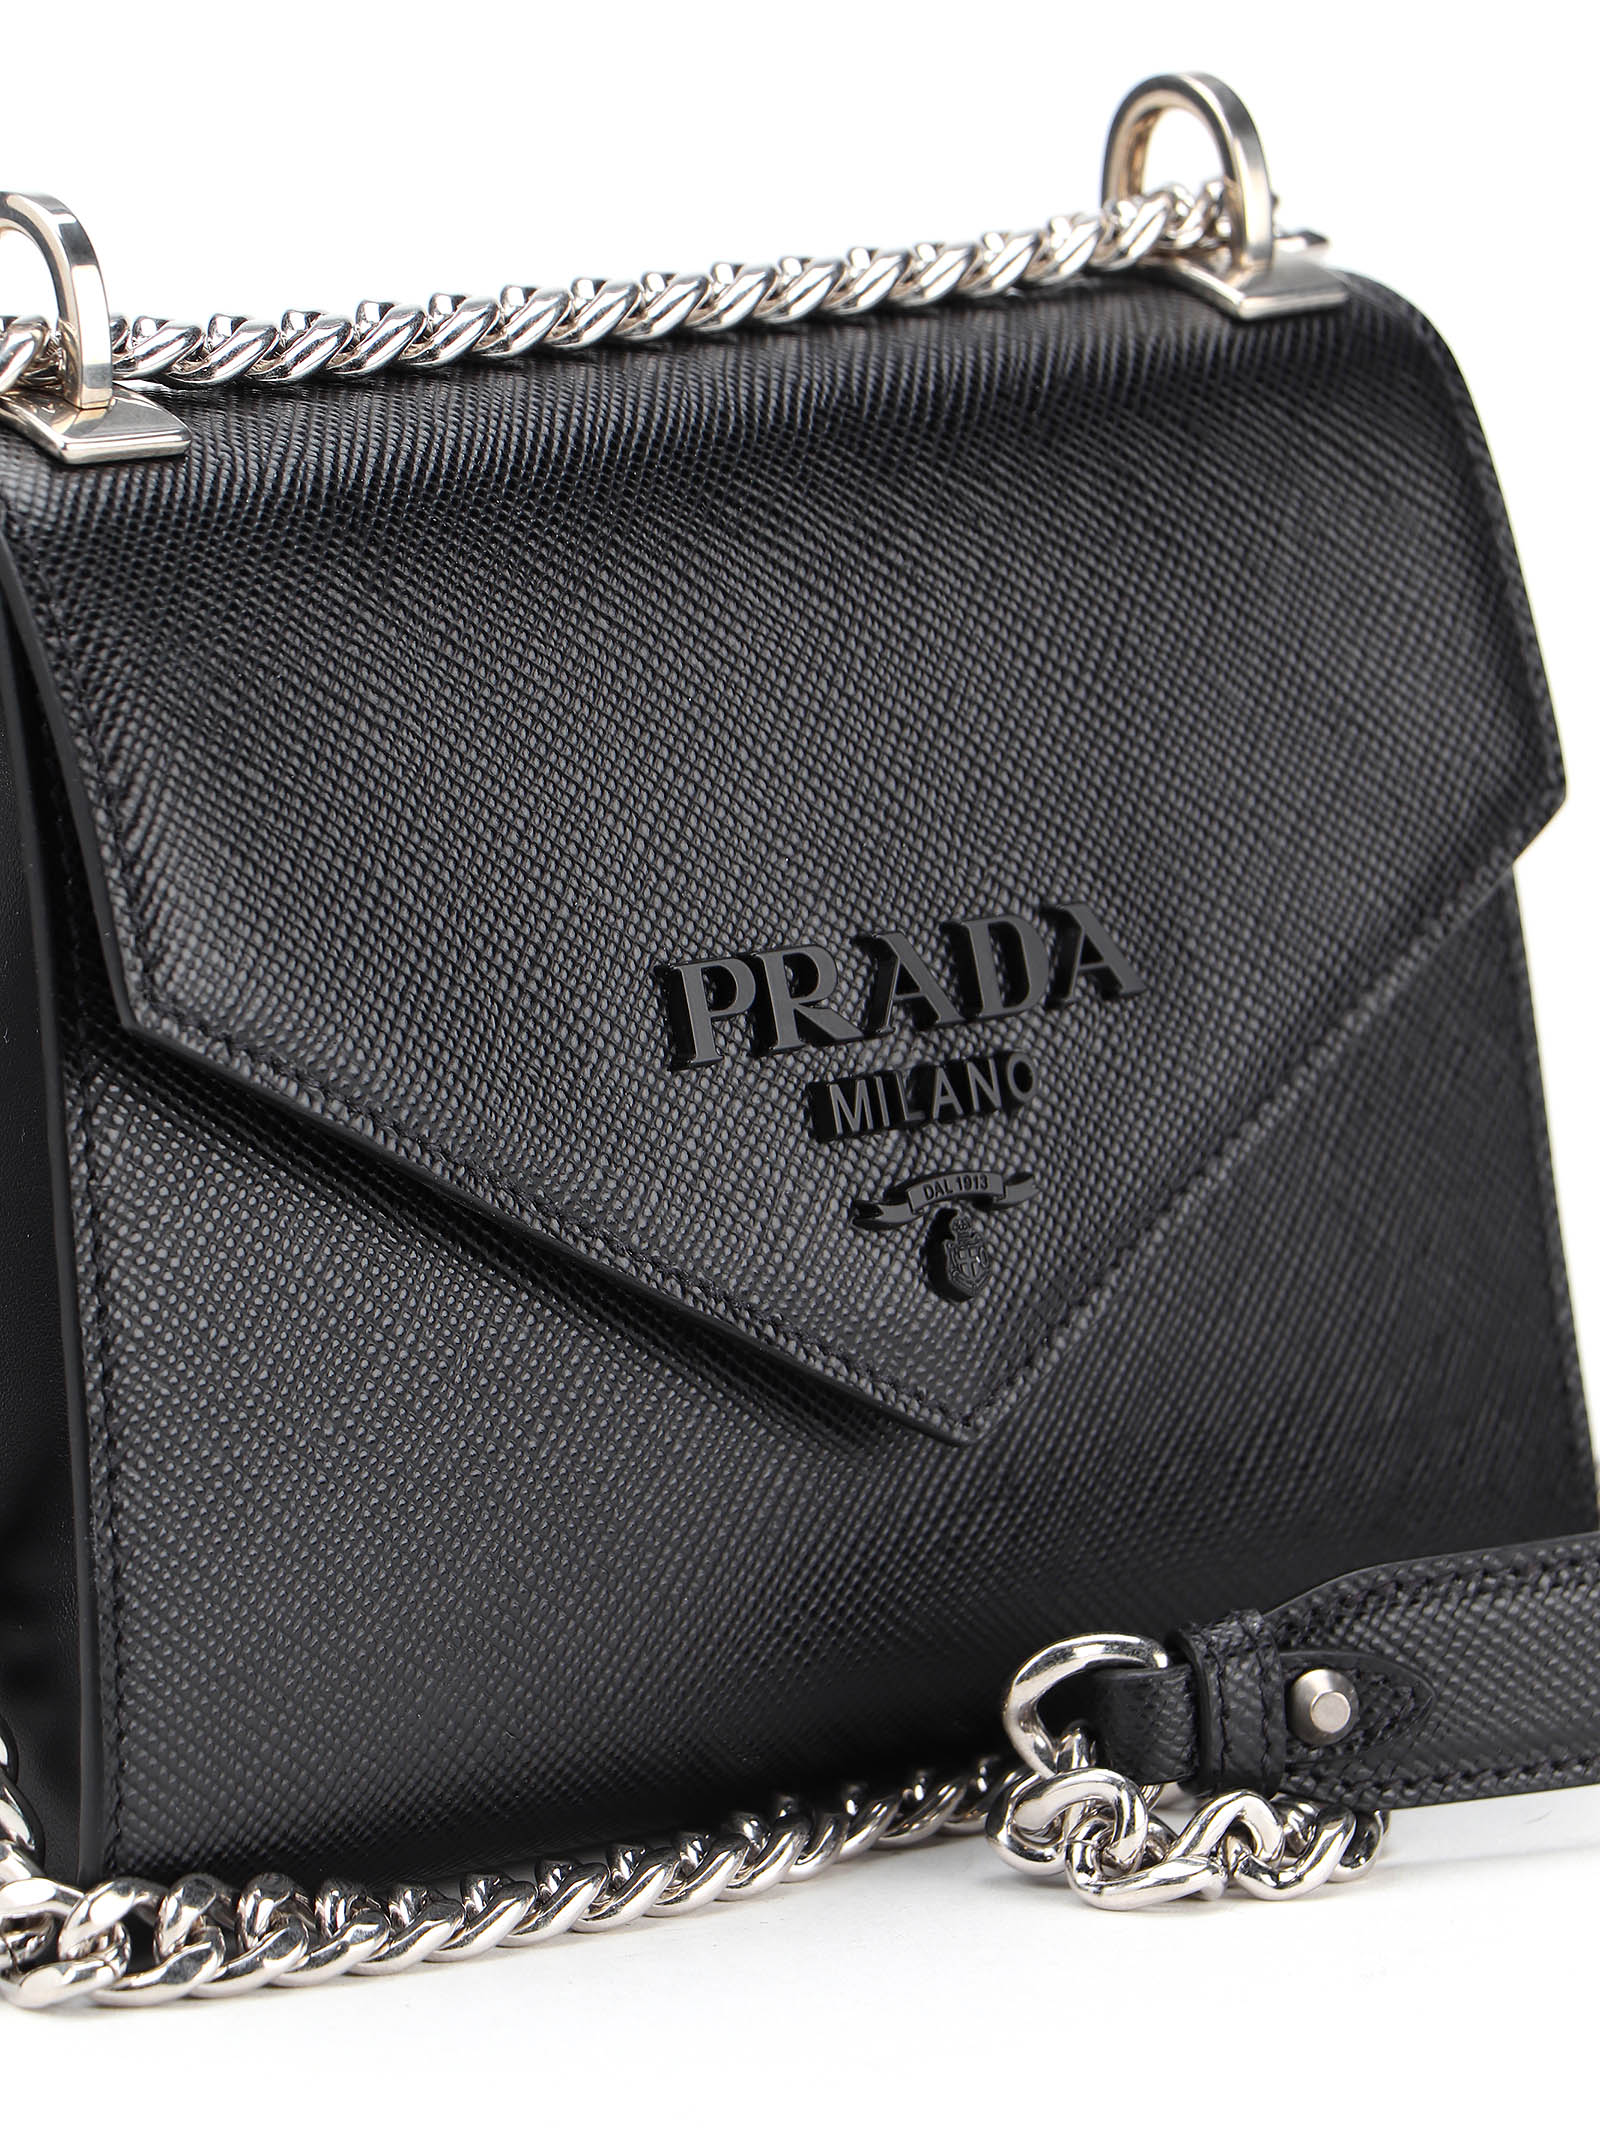 Immagine di Prada | Monochrome Bag